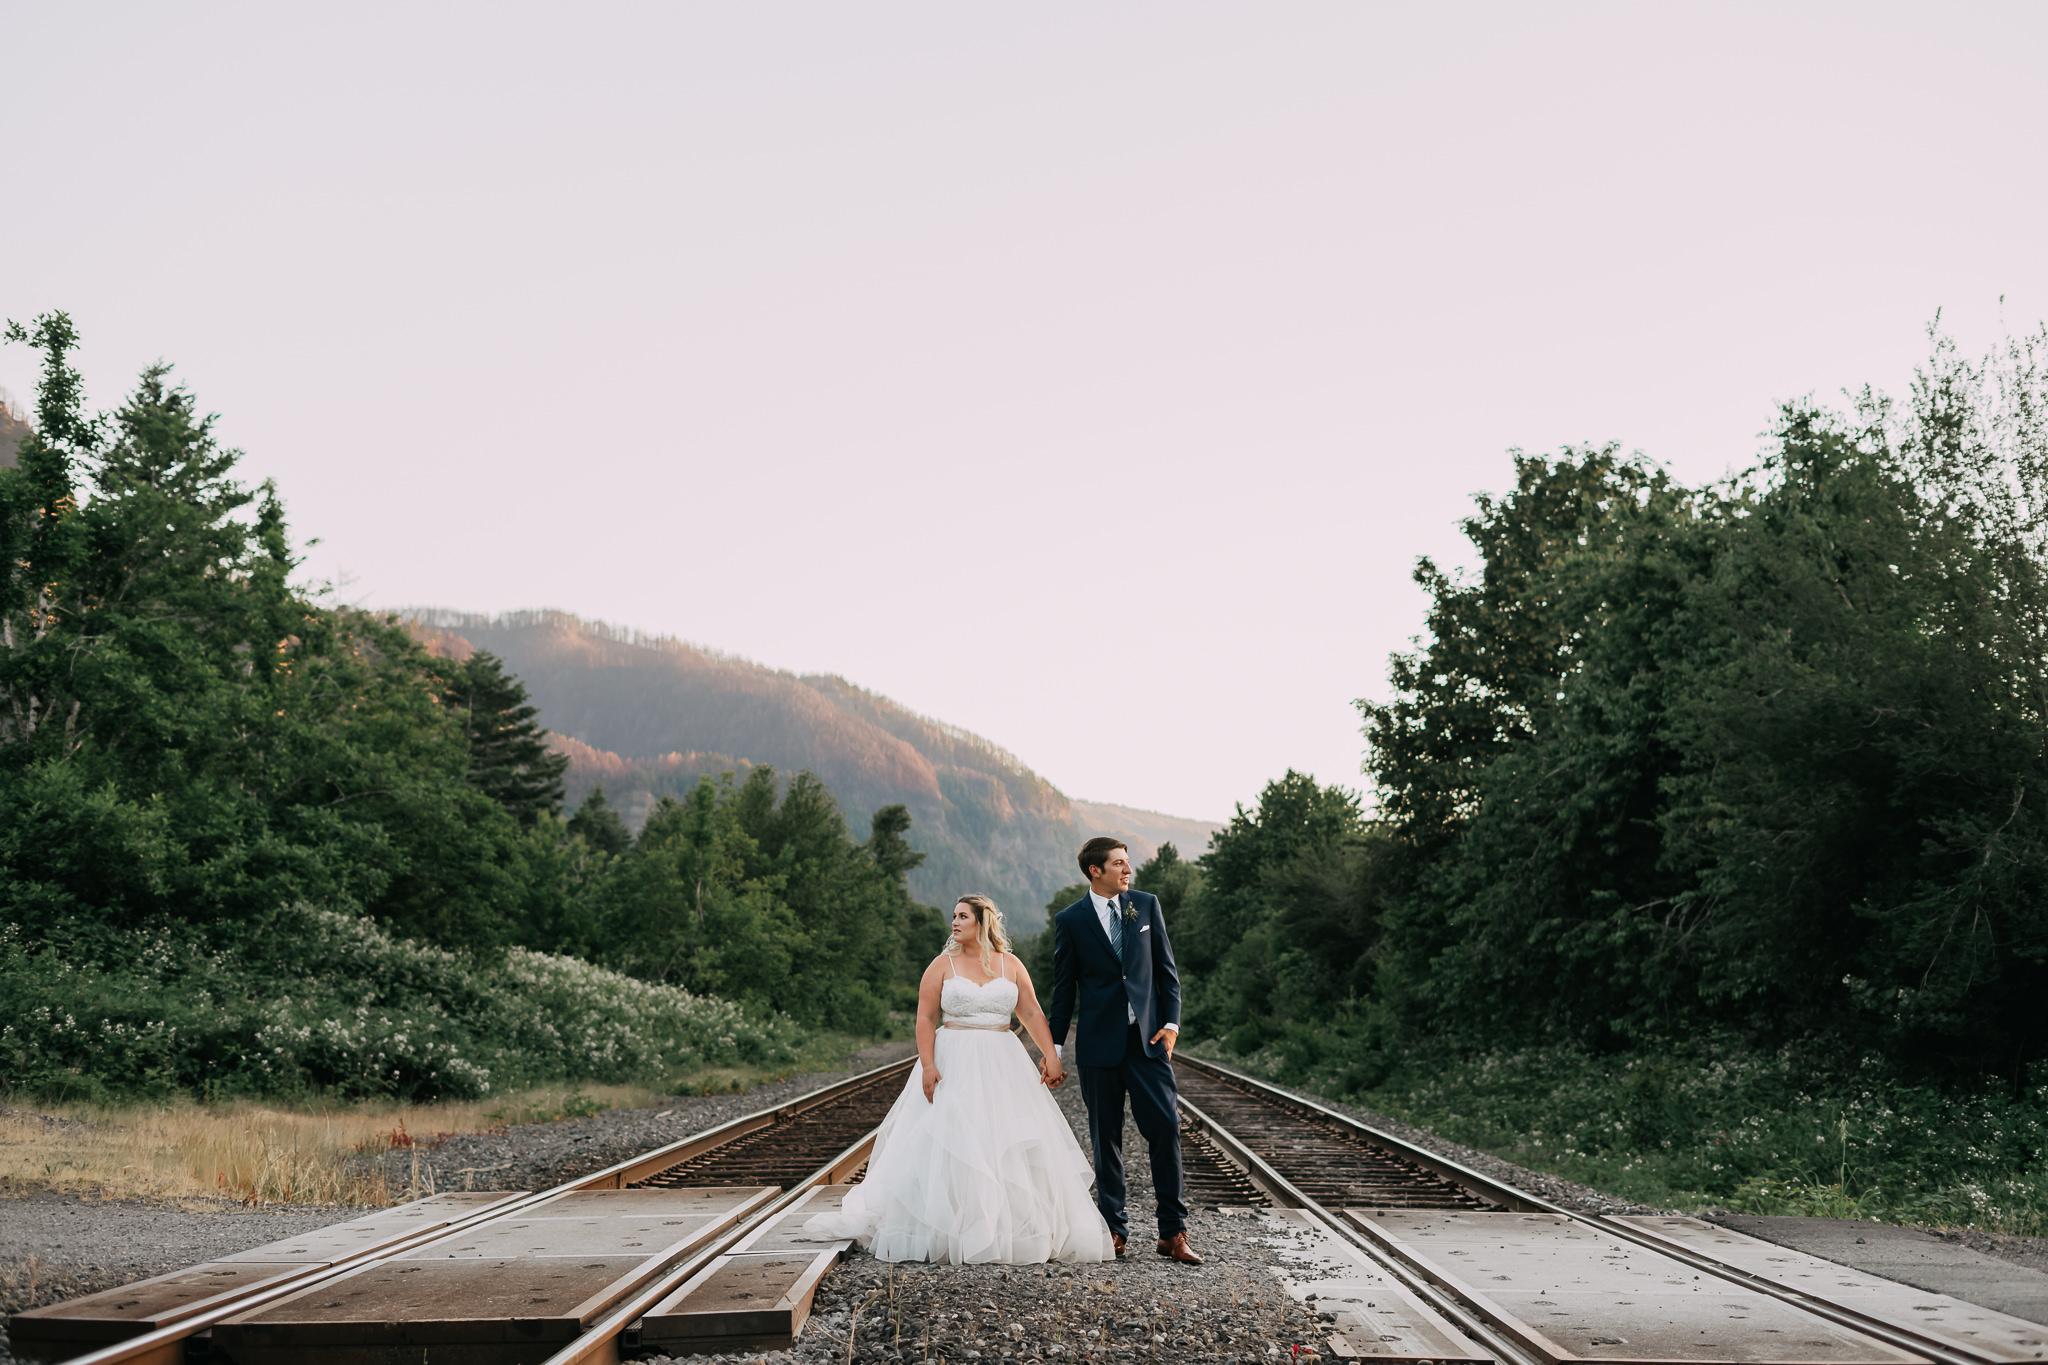 Wedding Photographer train track amateur wedding photography no-no Portland Oregon fish hatchery Cascade Locks